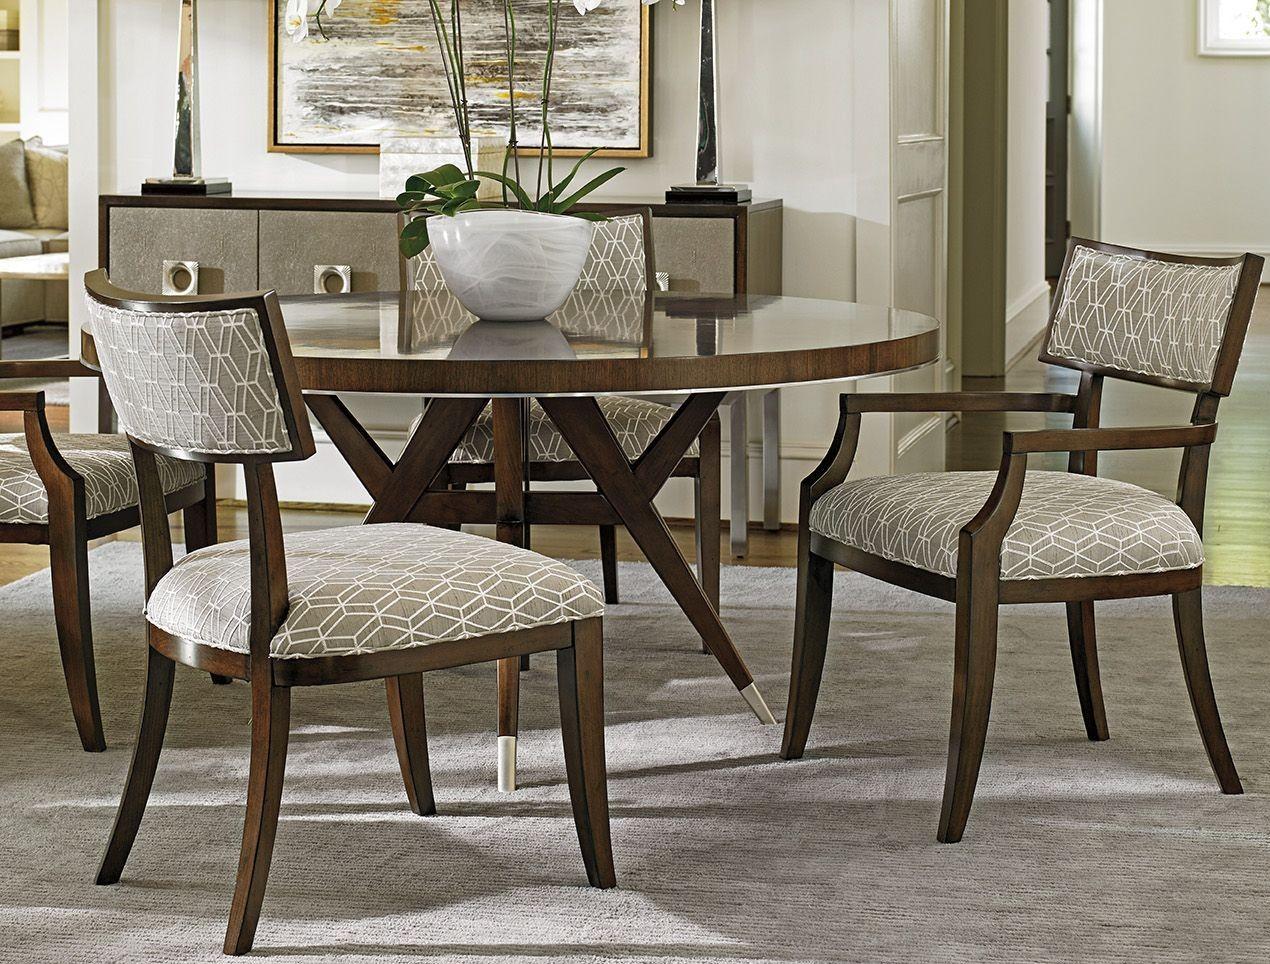 Macarthur park strathmore brown 60 round dining room set for Brown dining room set